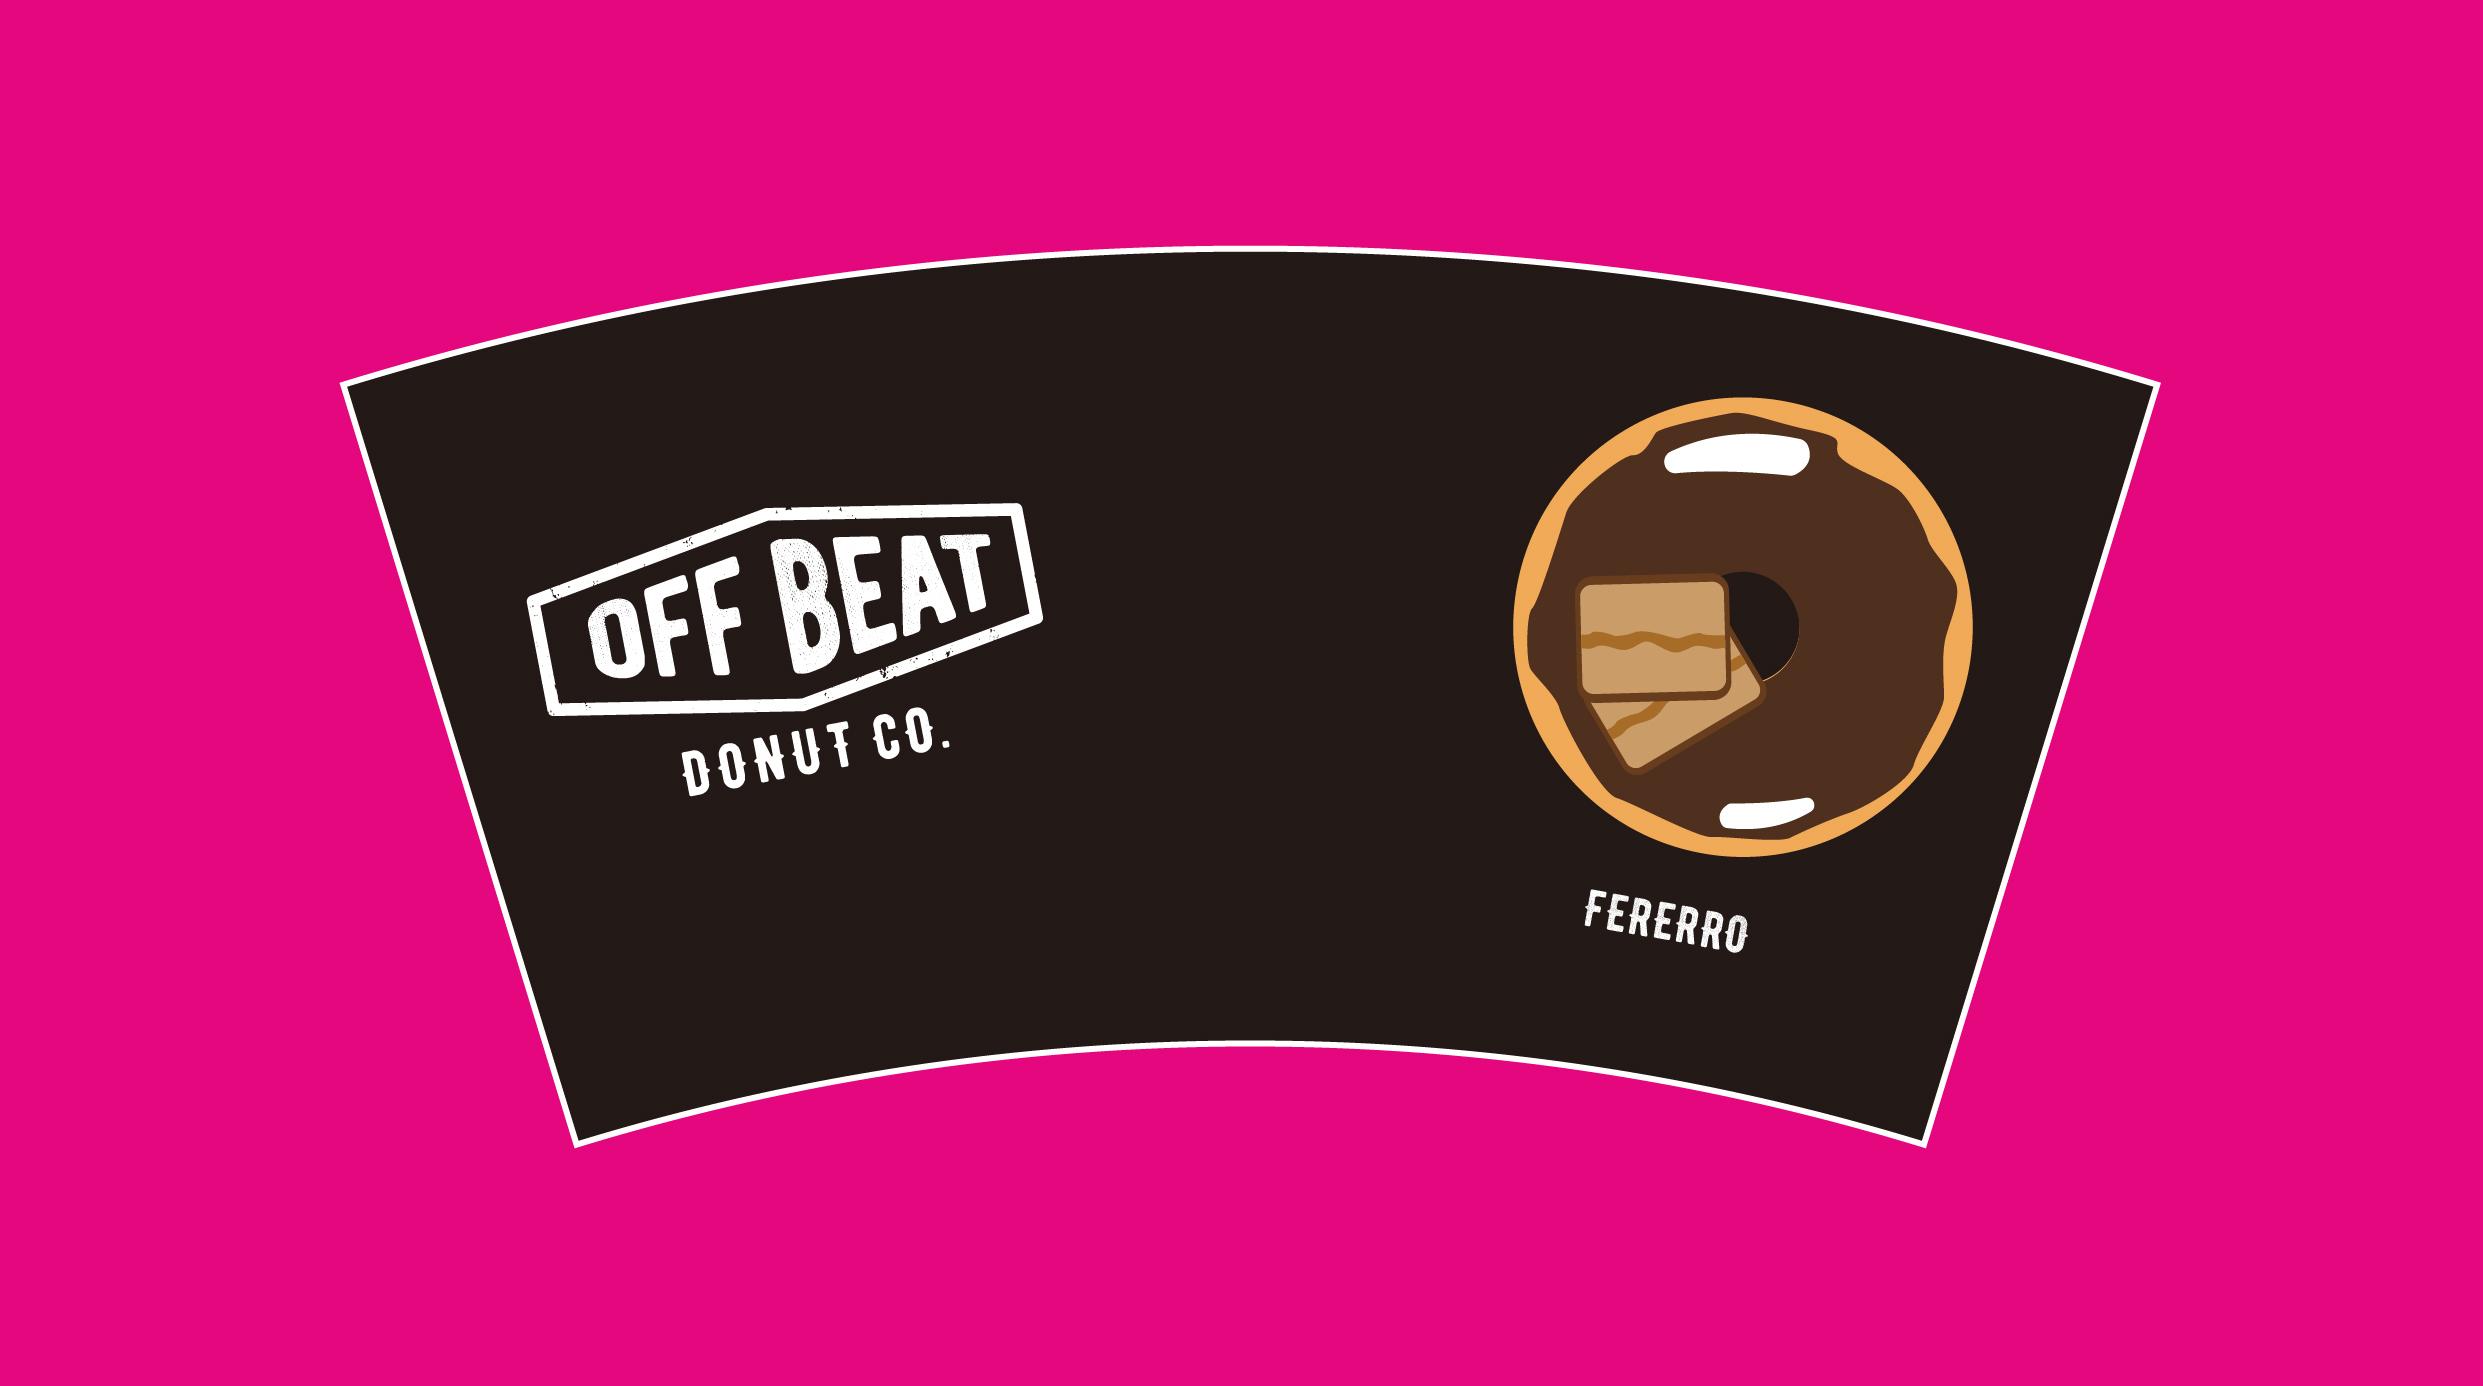 LMPP Offbeat Donuts Reusable Cup Design 2.jpg